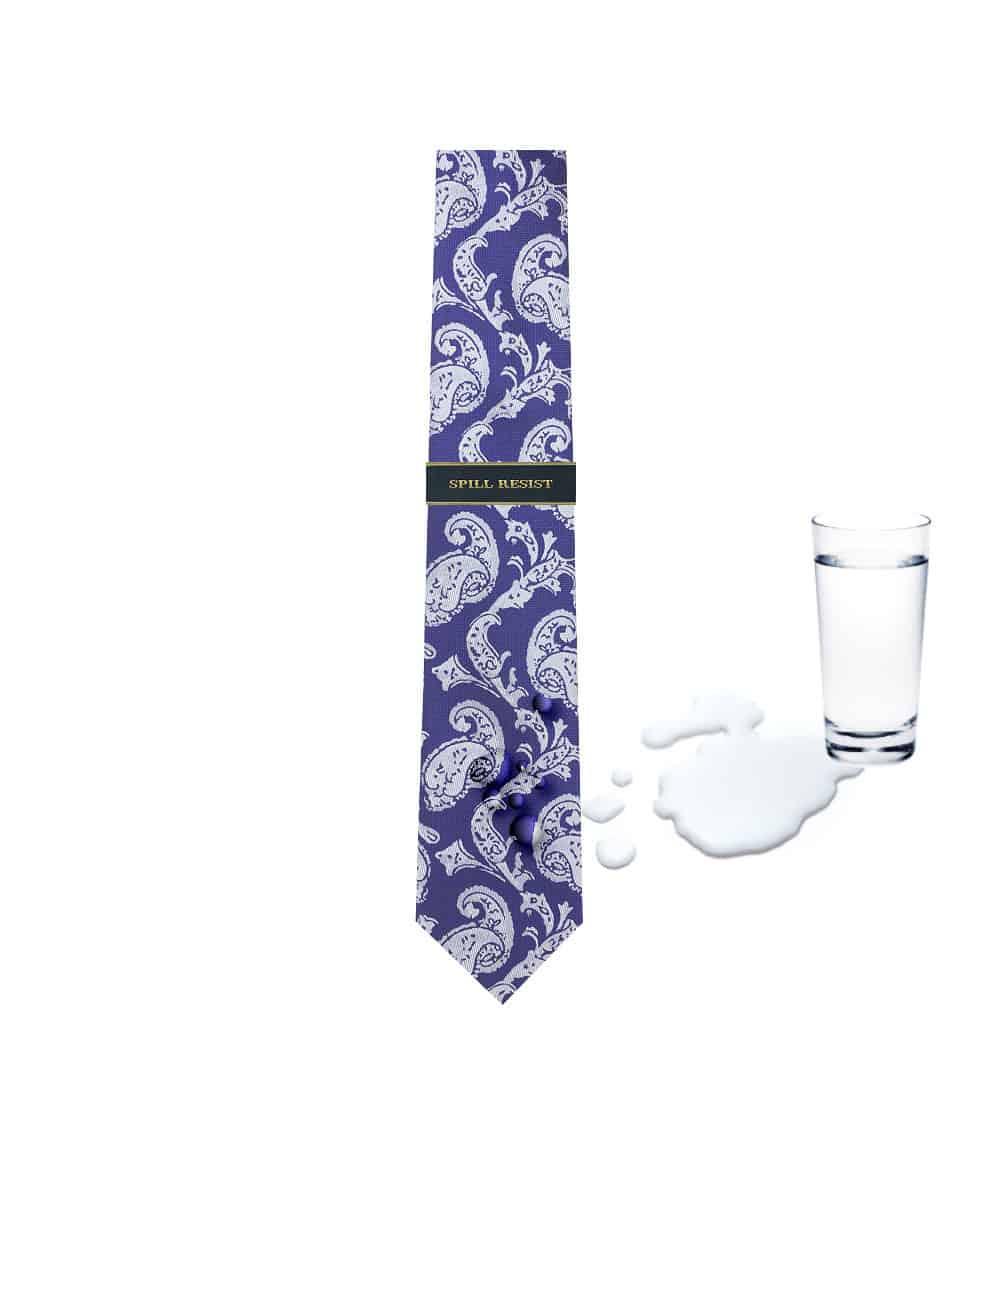 Purple Paisley Spill Resist Woven Necktie NT22.9